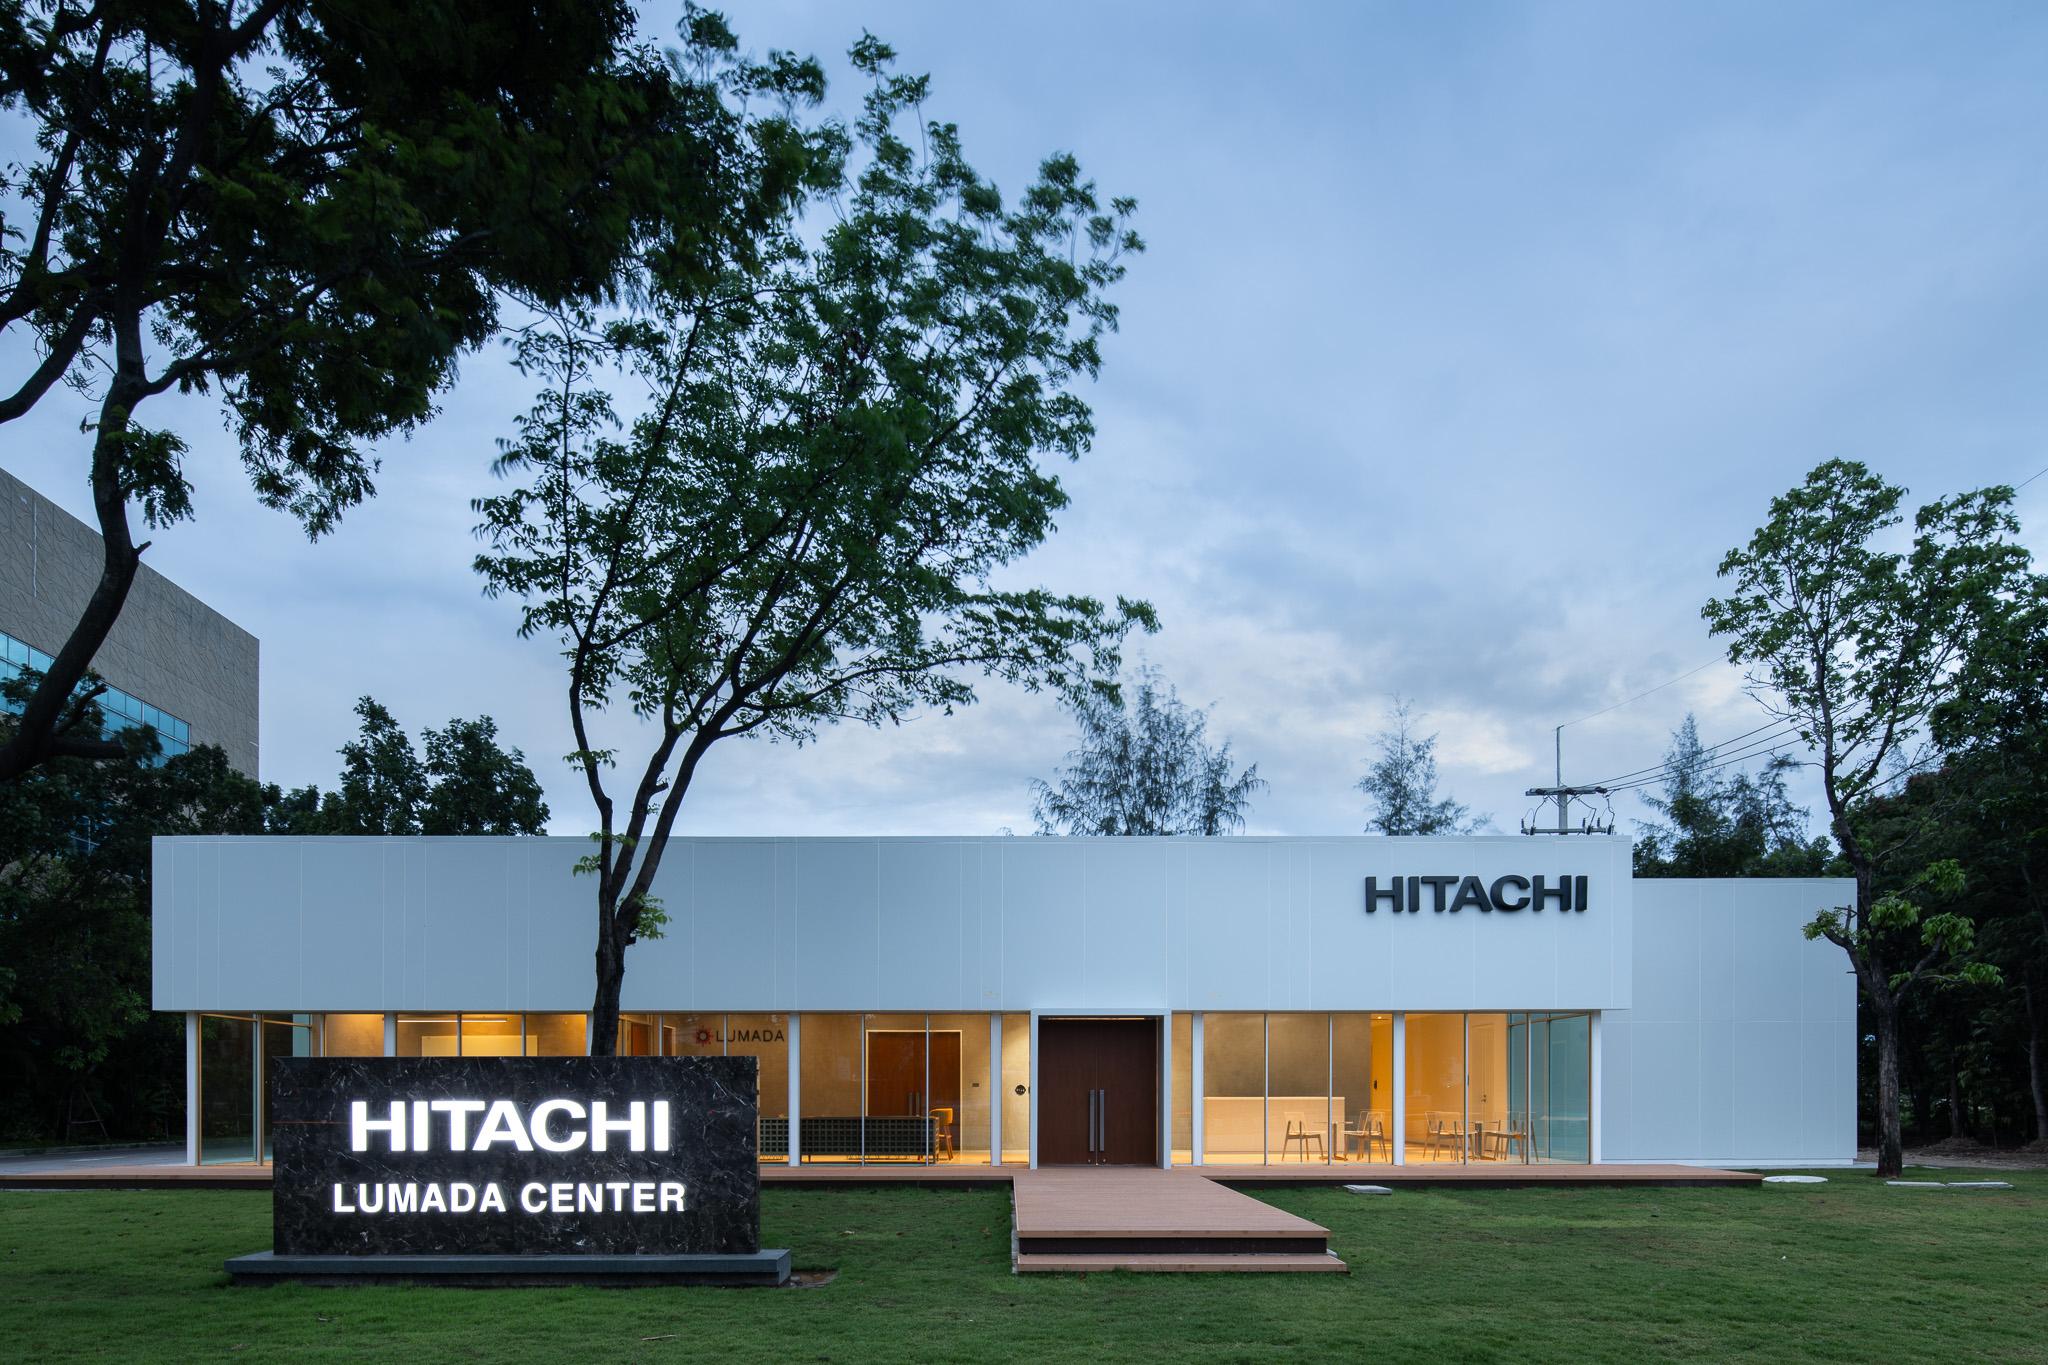 Hitachi Lumada